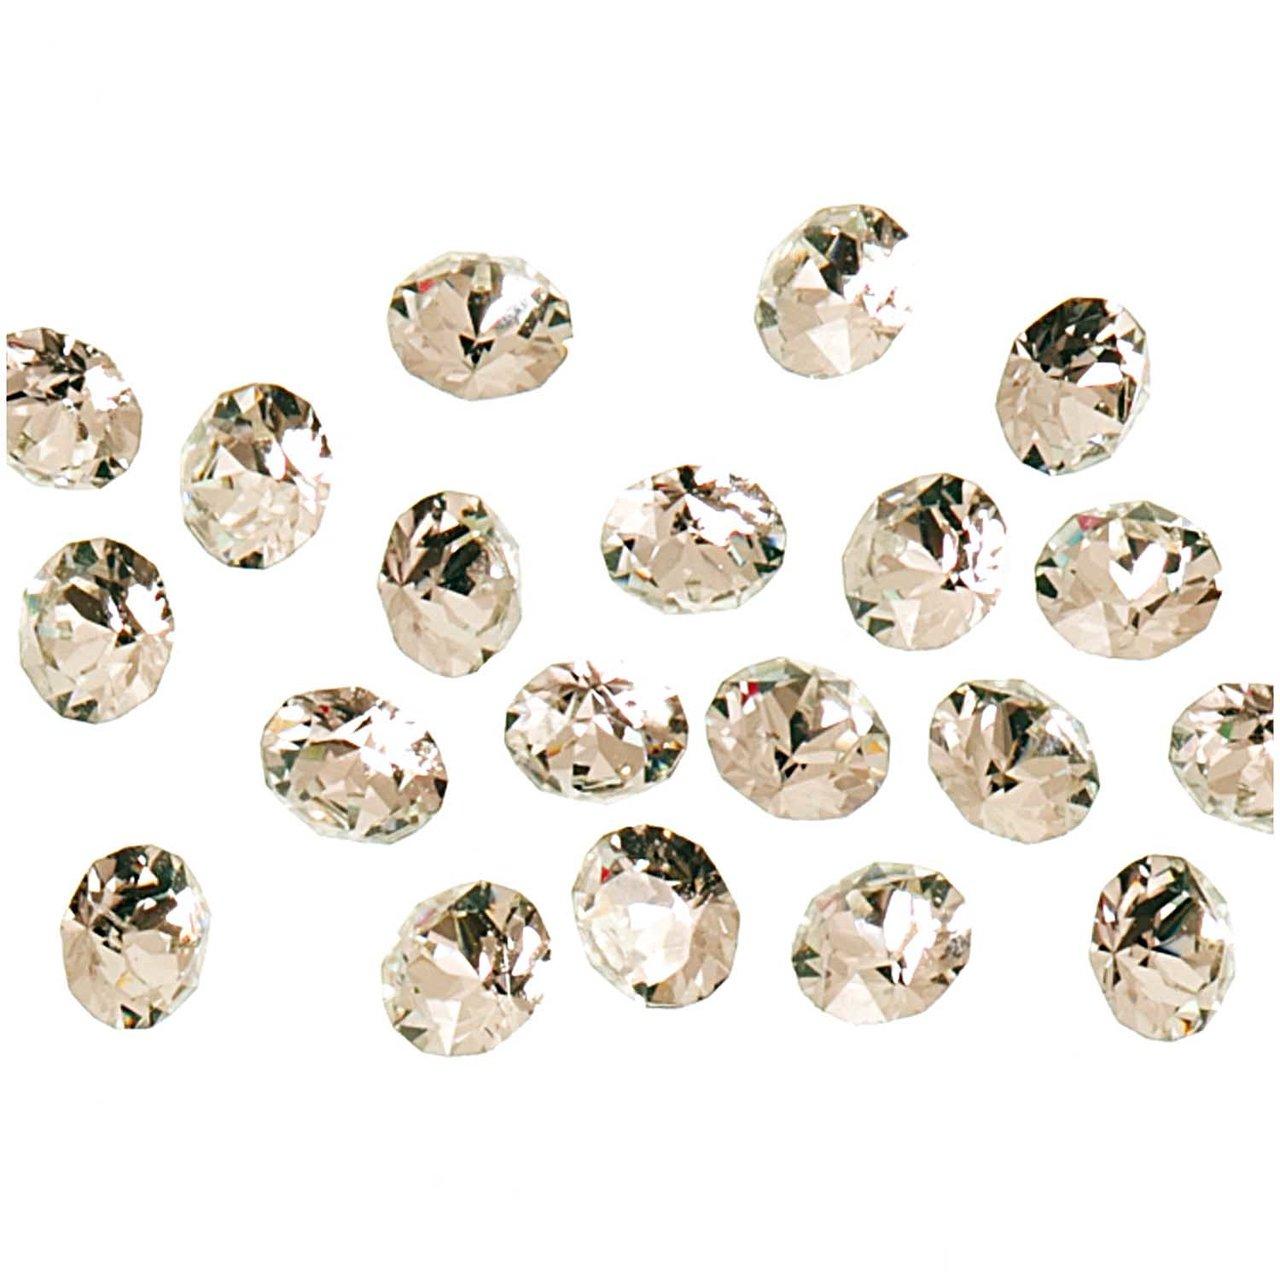 Swarovski® Strass-Steine spitz crystal 2mm 20 S...